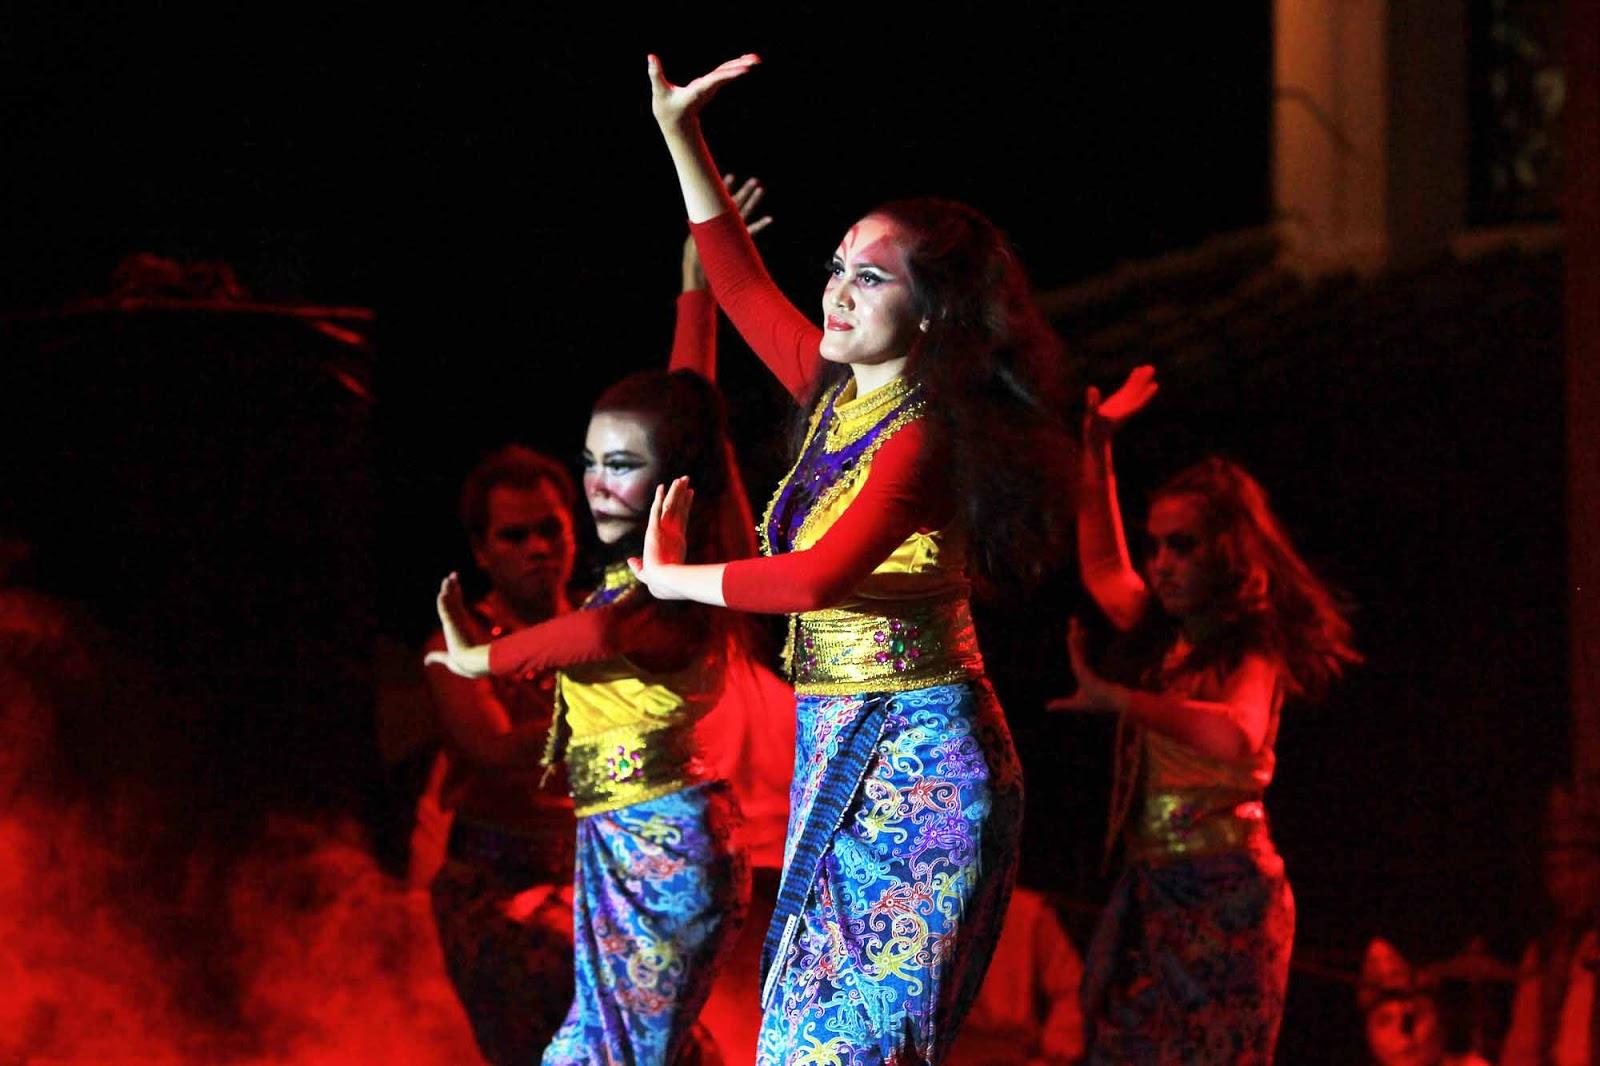 Tari Petake Gerinjing, Tarian Tradisional Dari Sumatera Selatan